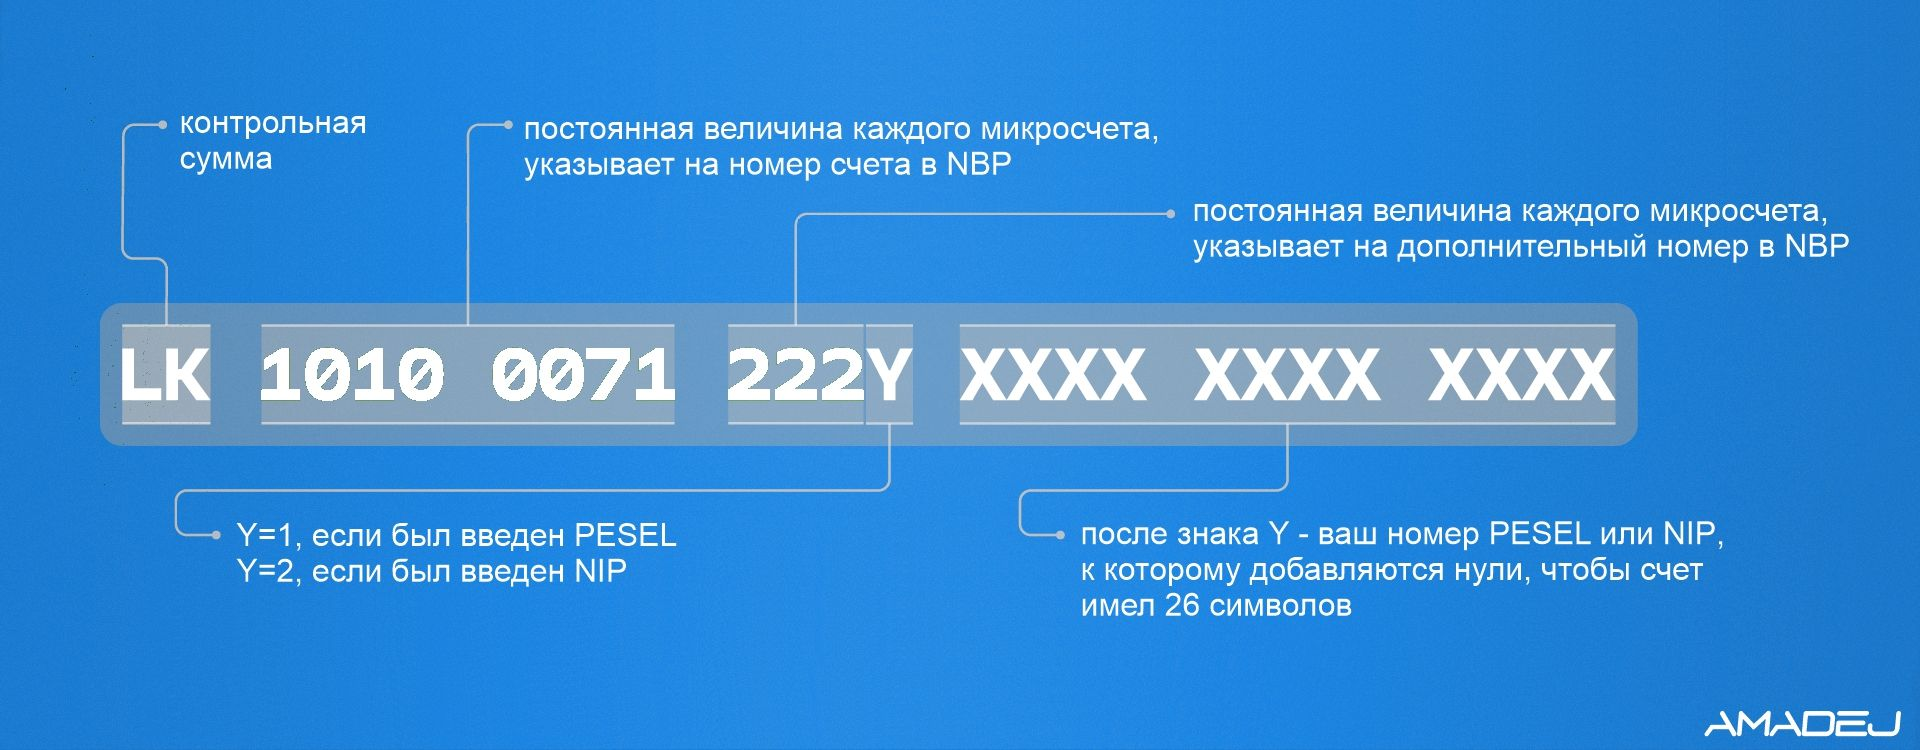 Структура номера налогового счета